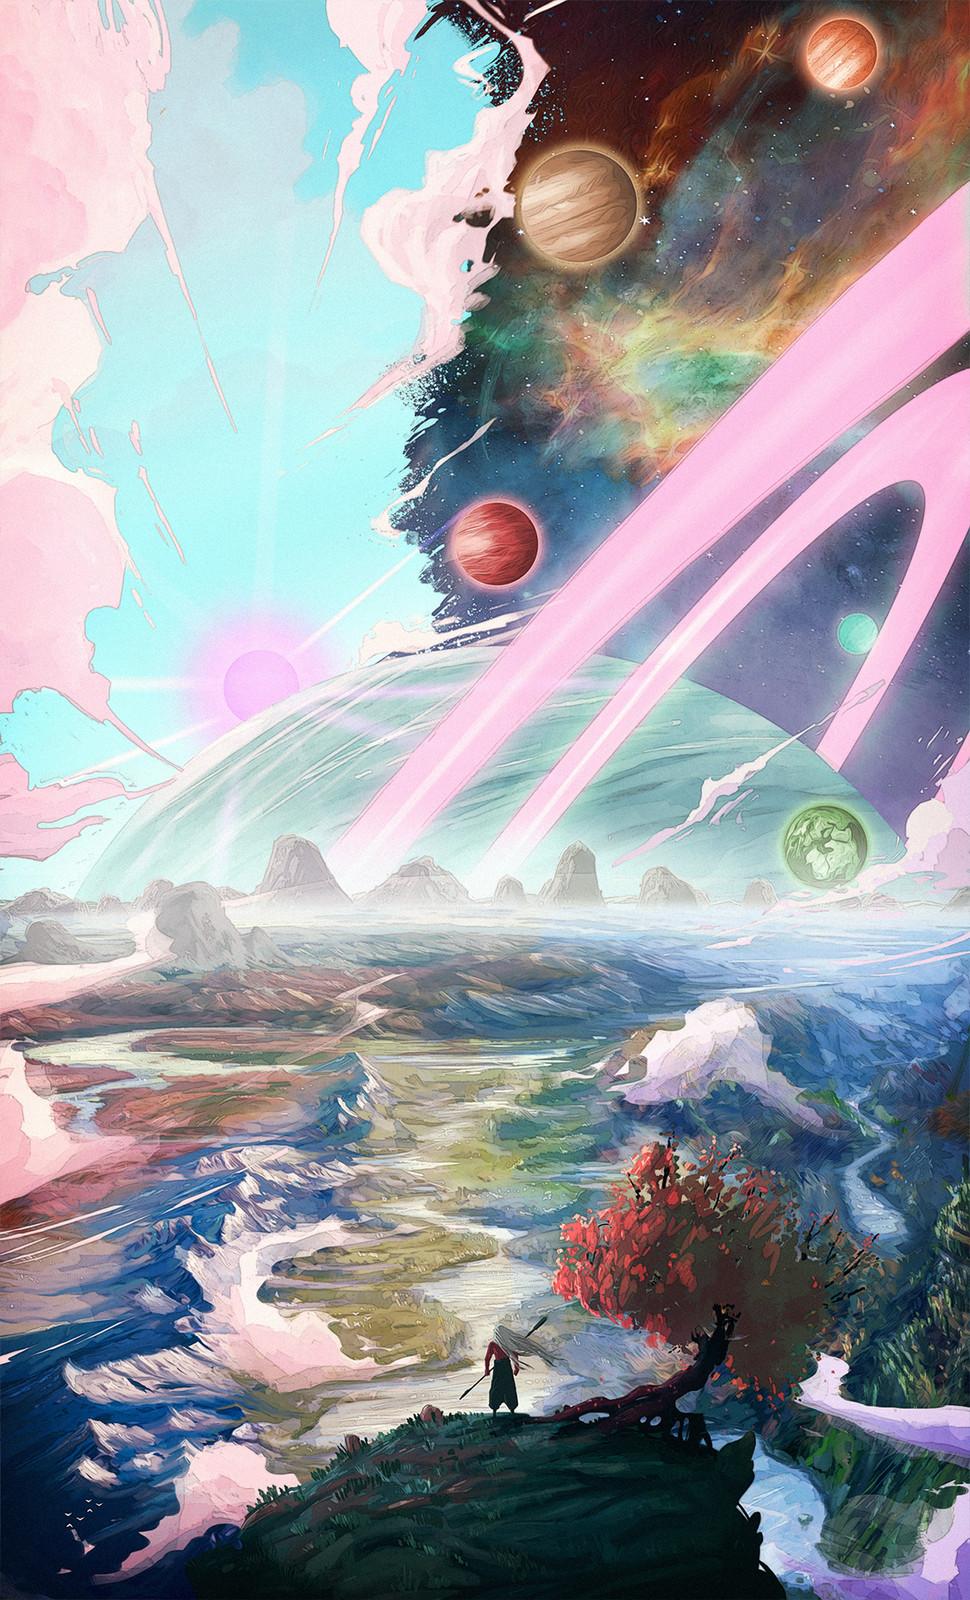 Universes (Cover Book Illustration)